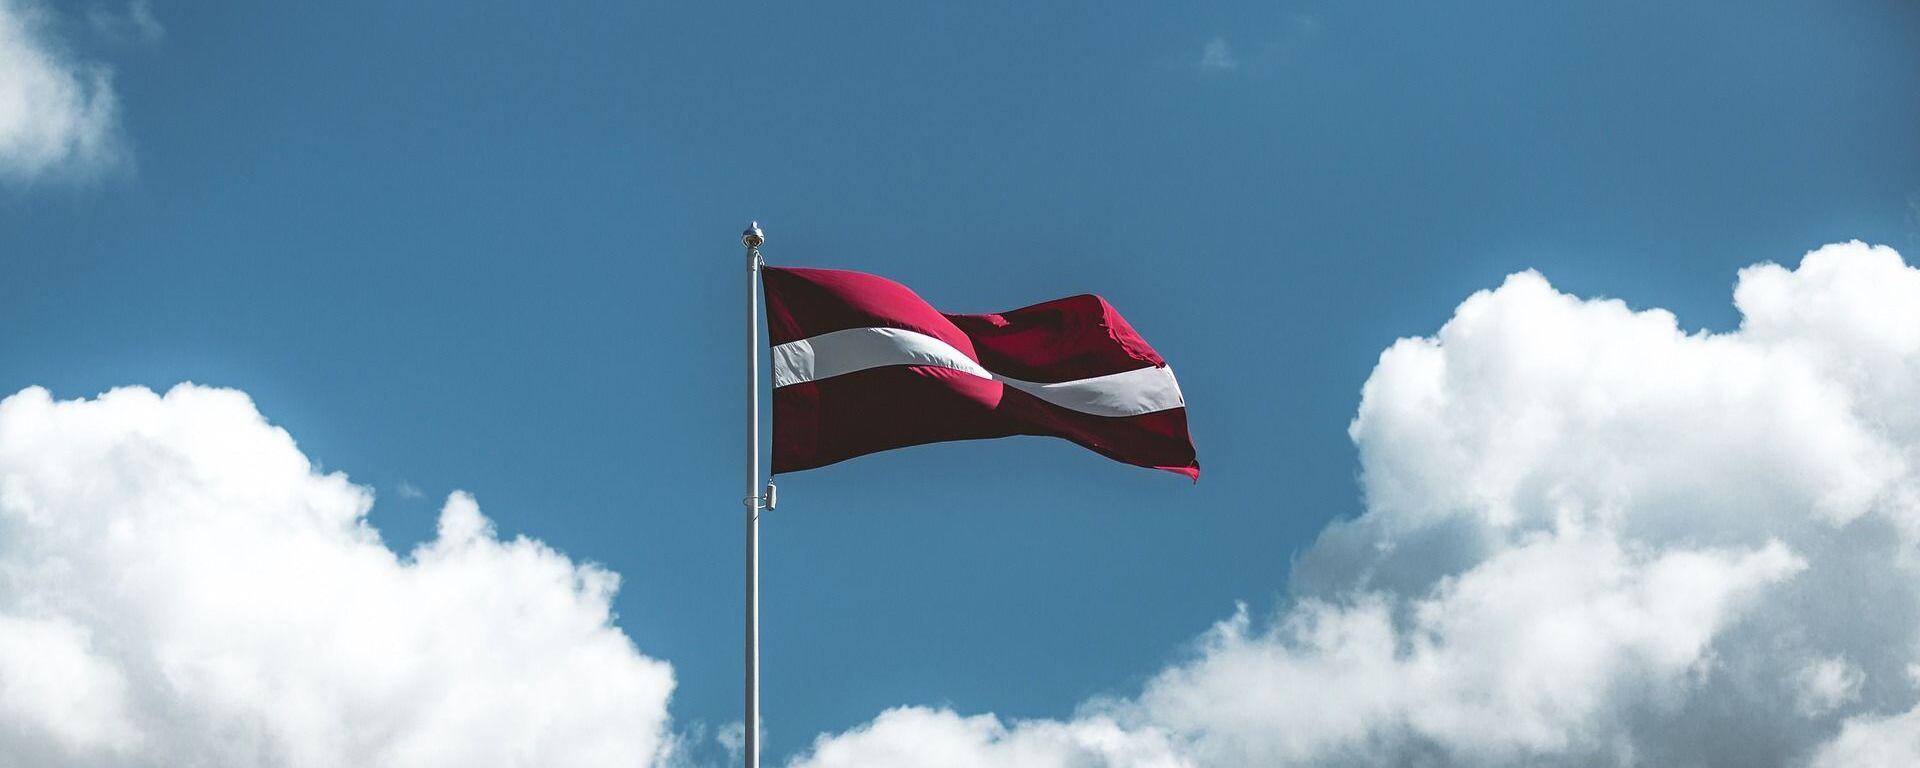 Флаг Латвии, архивное фото - Sputnik Latvija, 1920, 21.12.2020